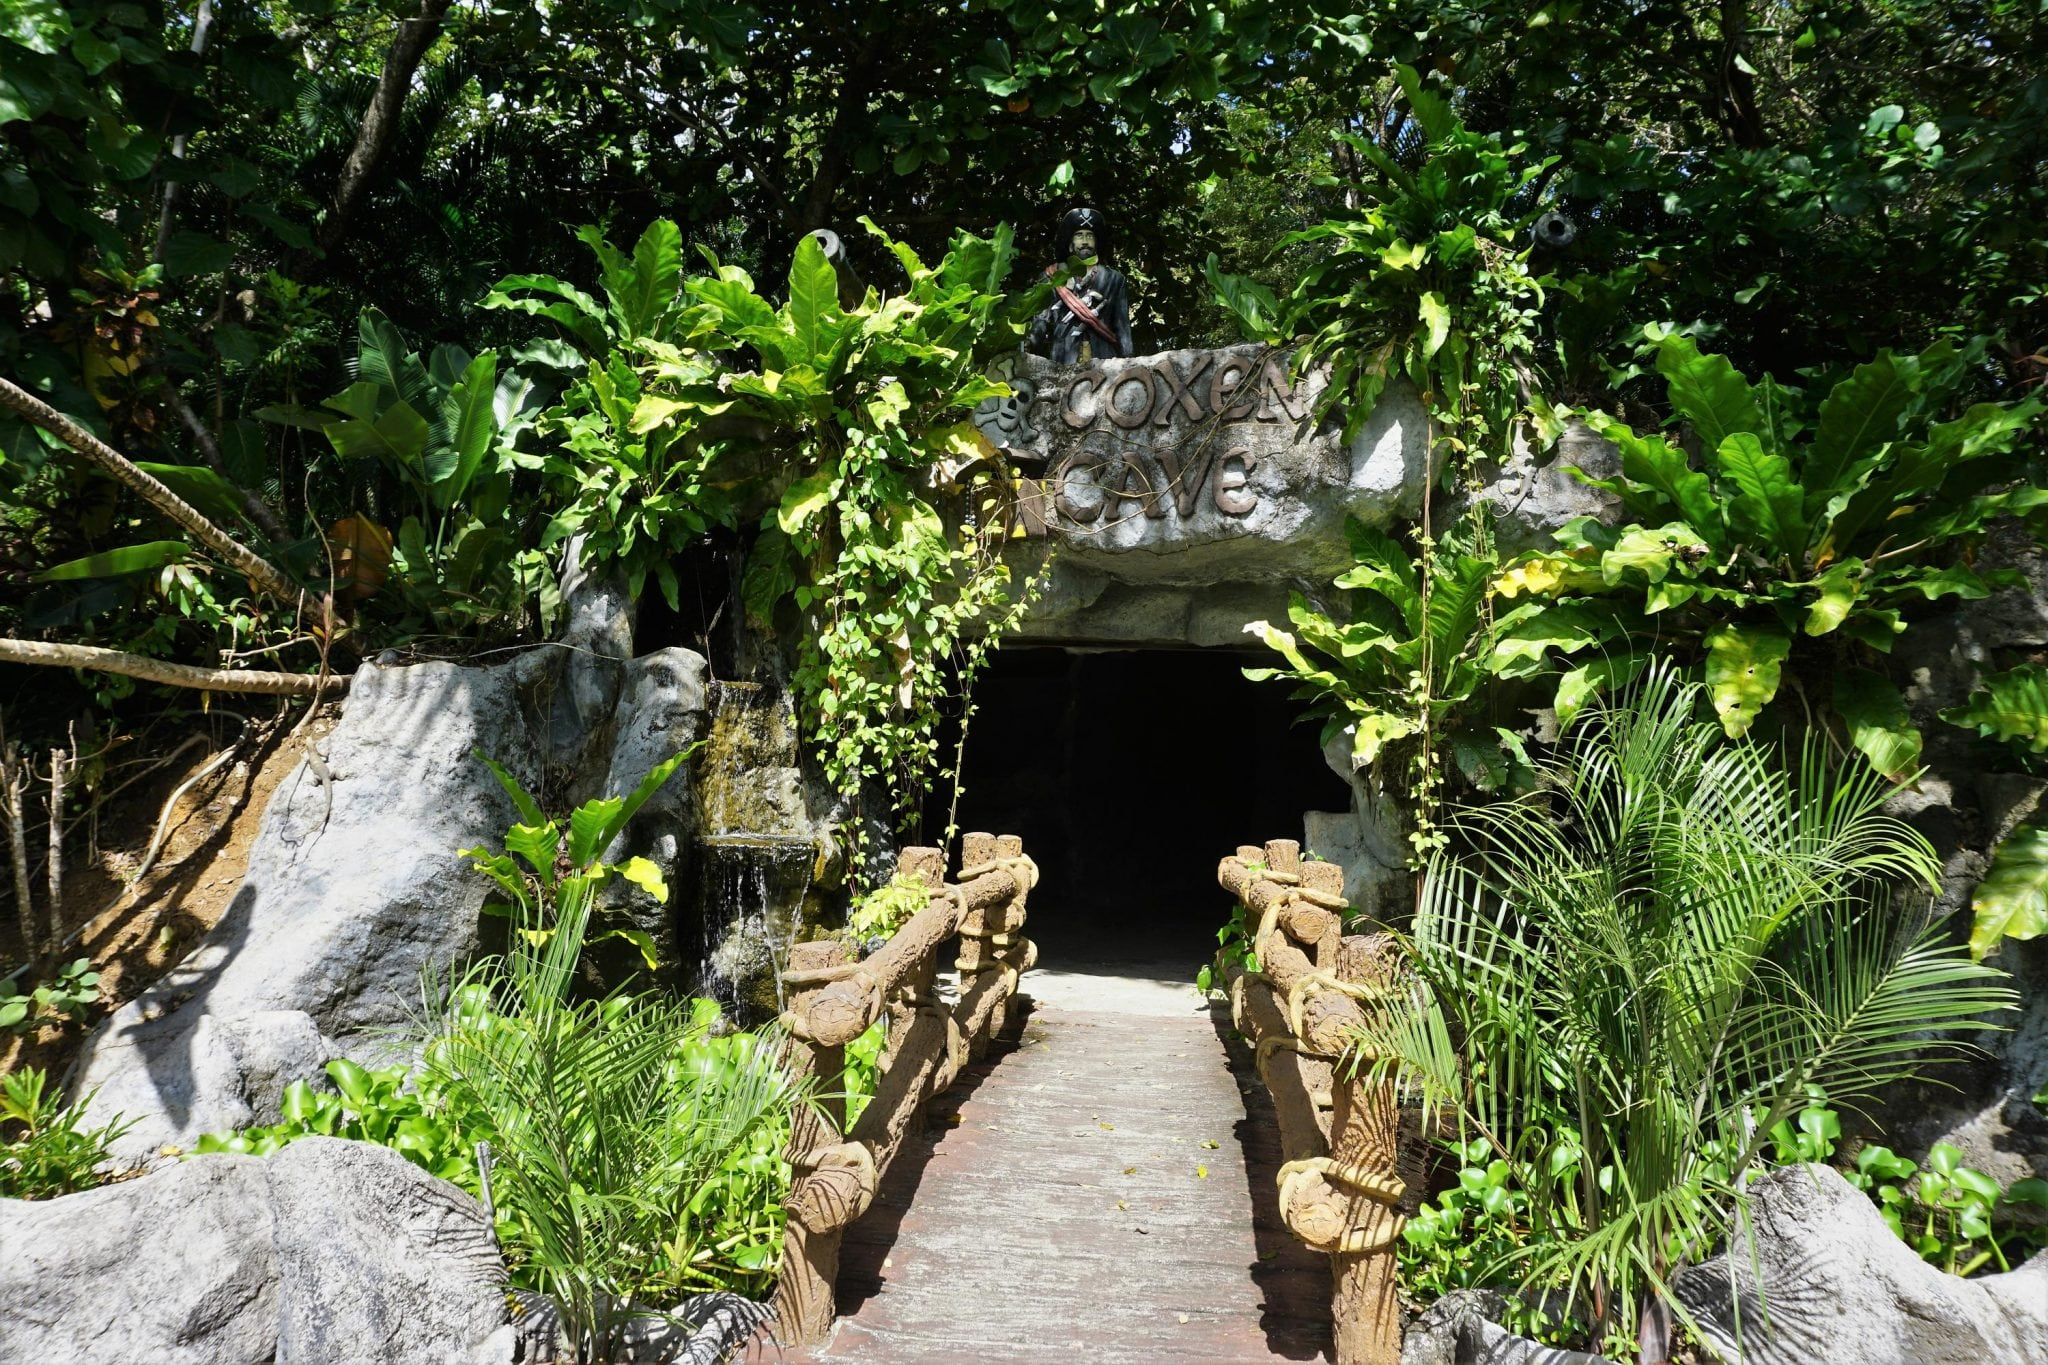 6 Top Photos to Take at Gumbalimba Park Roatan Honduras